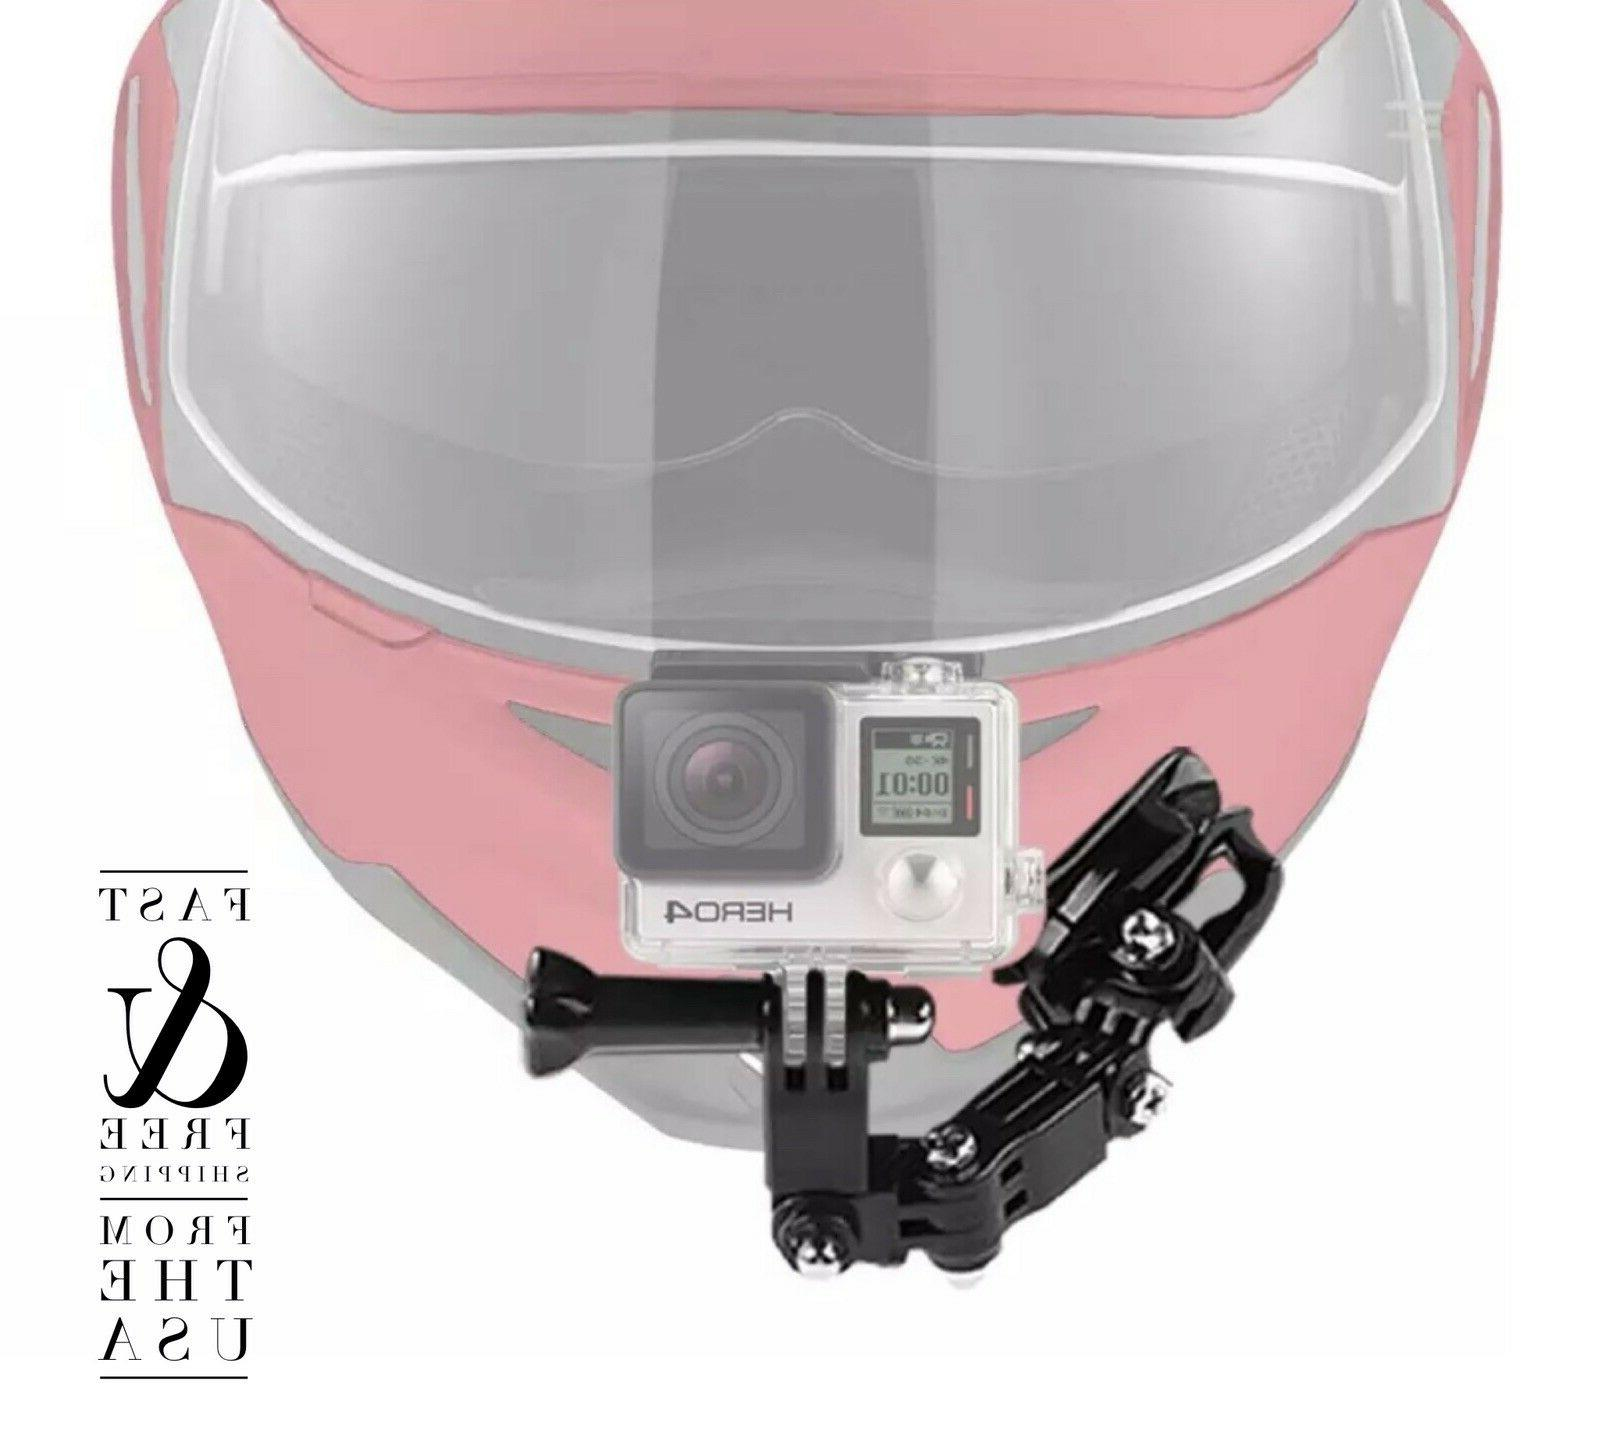 Gopro Motorcycle Helmet Mount Swivel For Hero 3 4 5 6 7 Session Action Camera